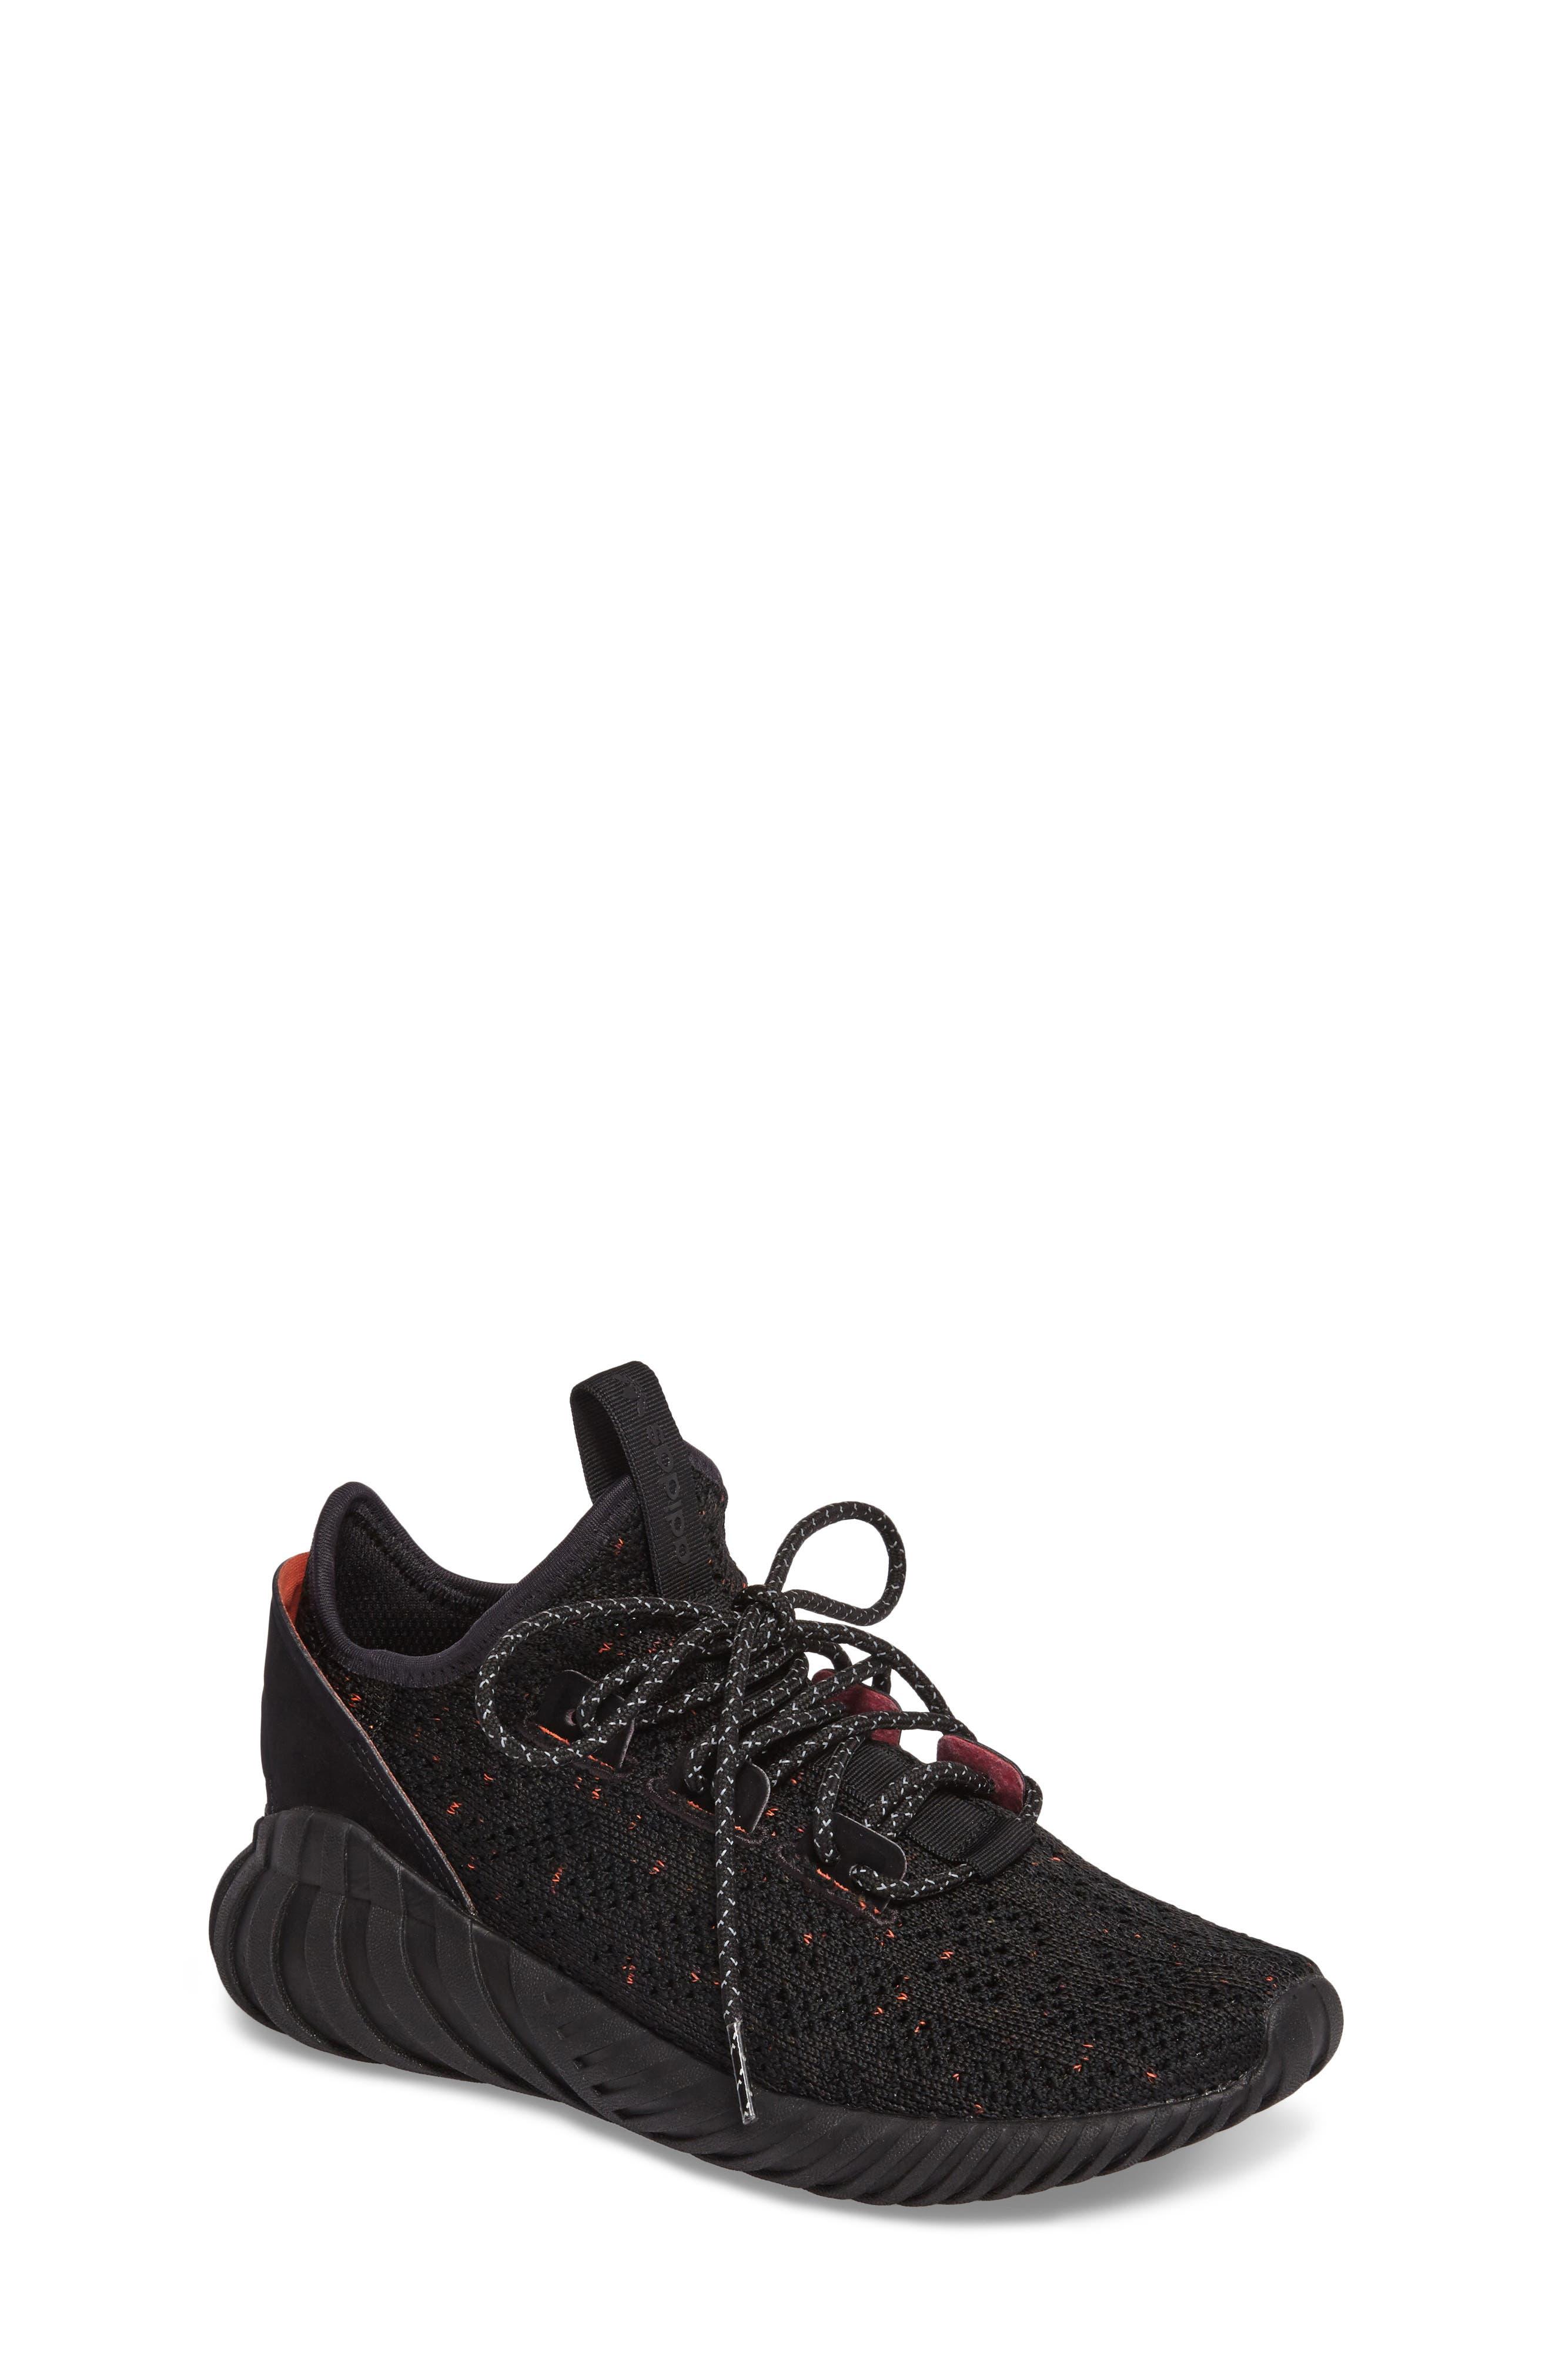 Main Image - adidas Tubular Doom Primeknit Sneaker (Big Kid)